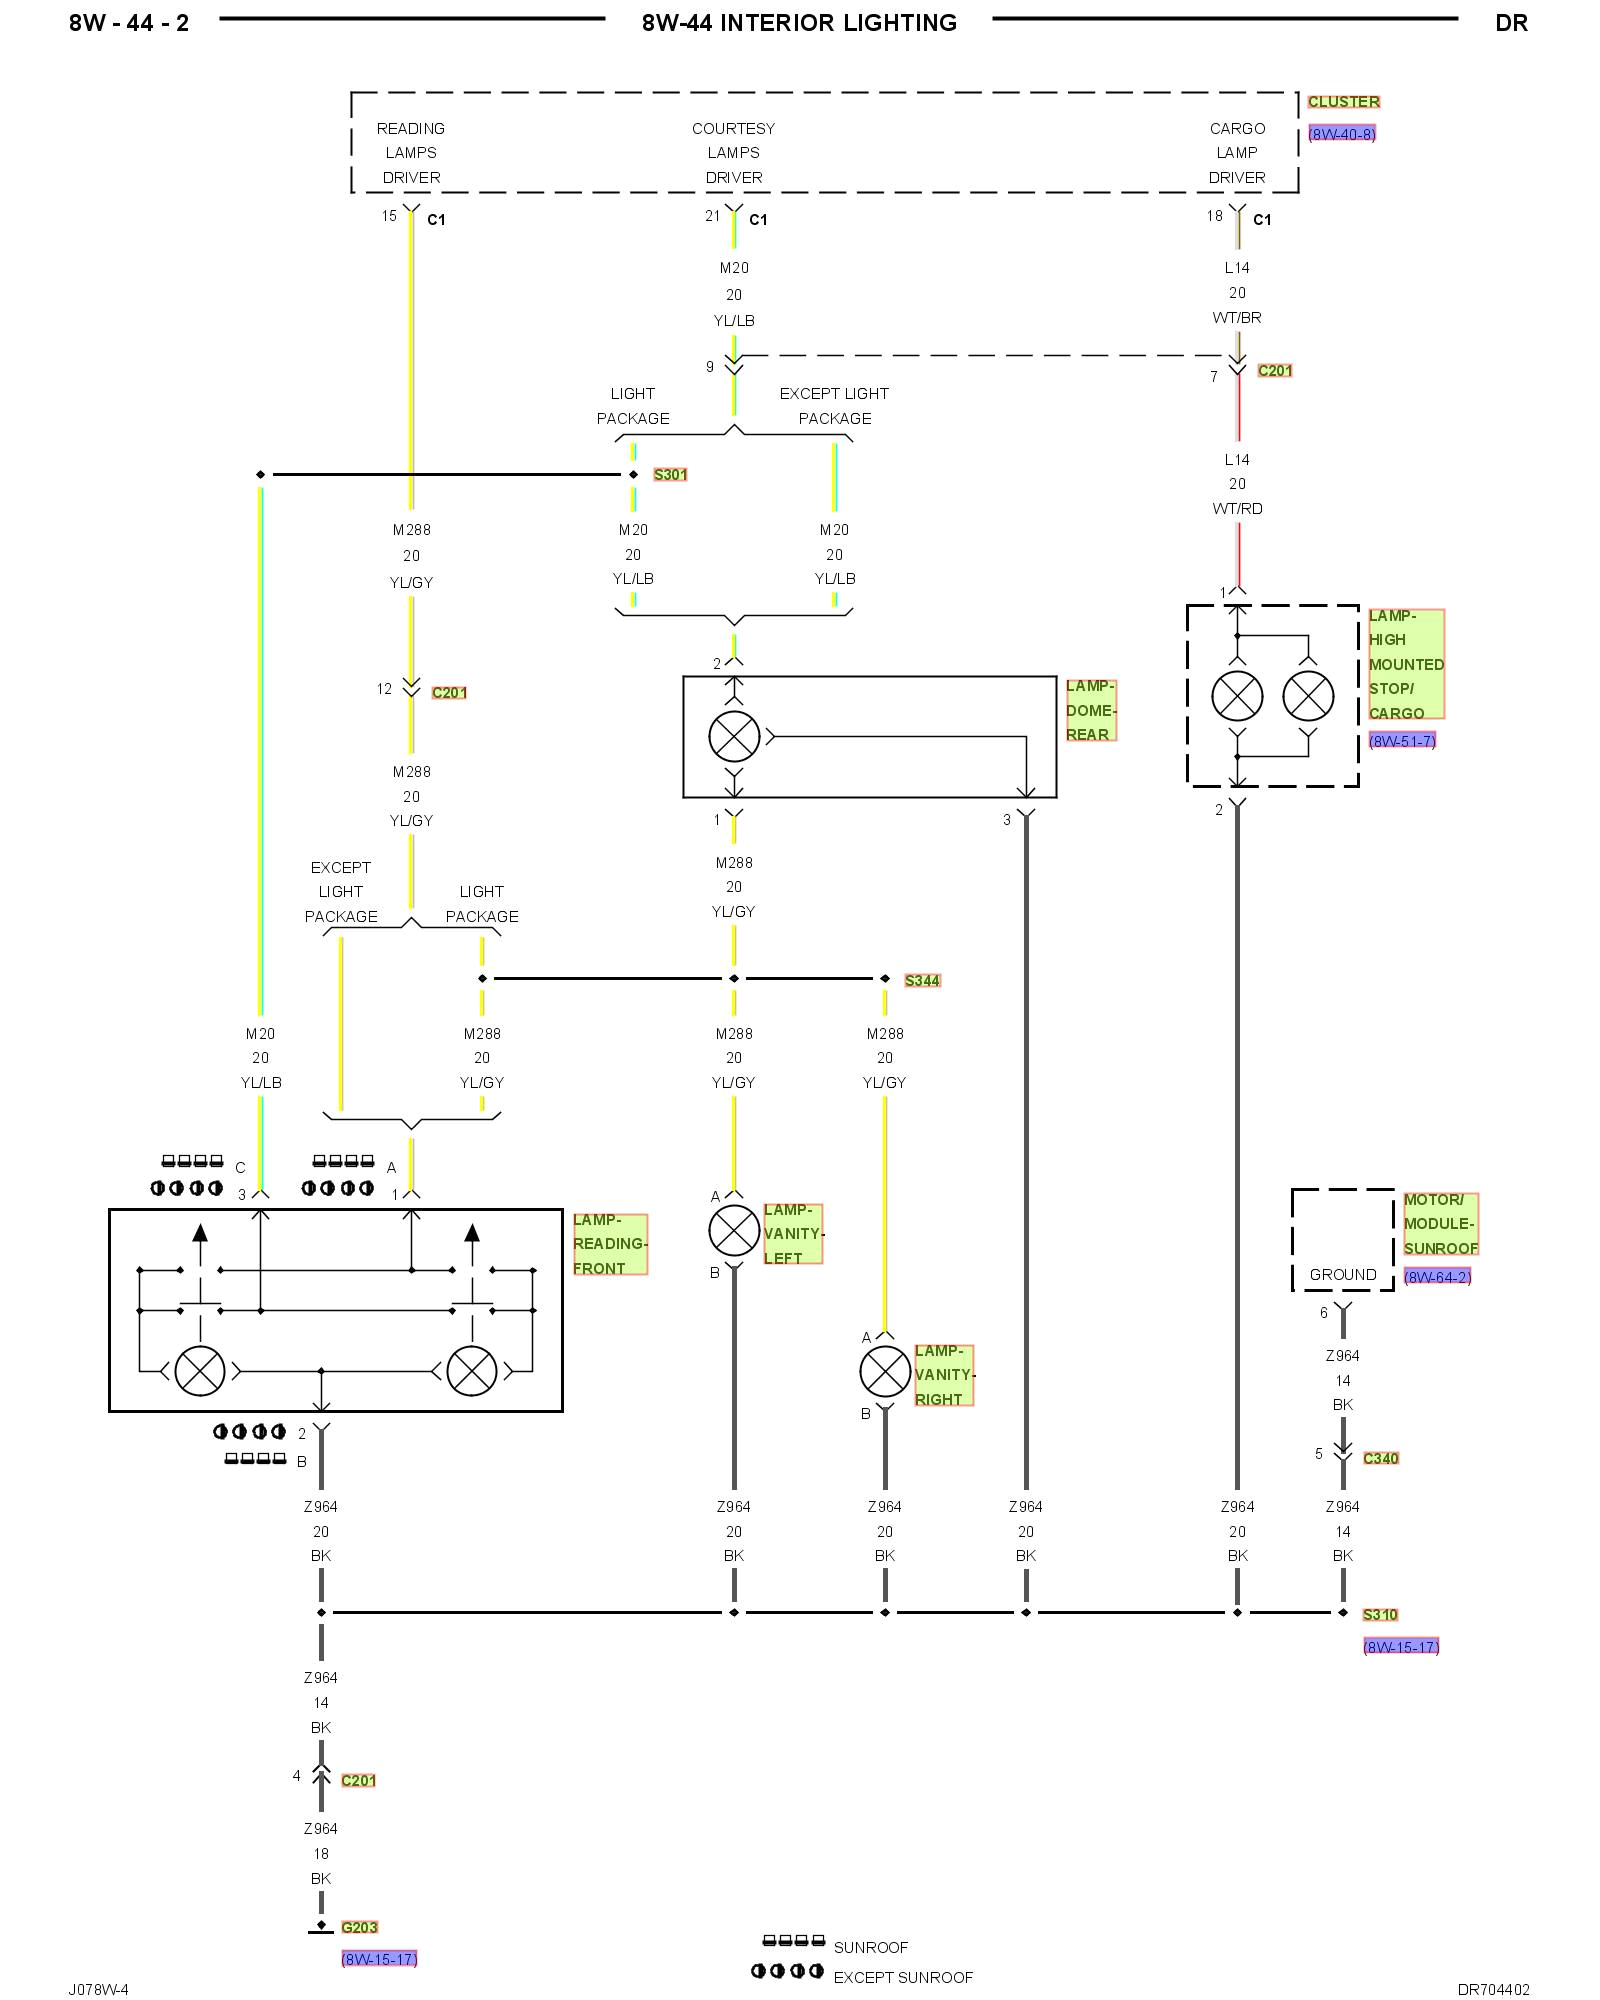 [WQZT_9871]  1996 dodge ram 2500 diesel wiring diagram | 2008 Dodge Ram Radio Wiring Diagram |  | design-community.net